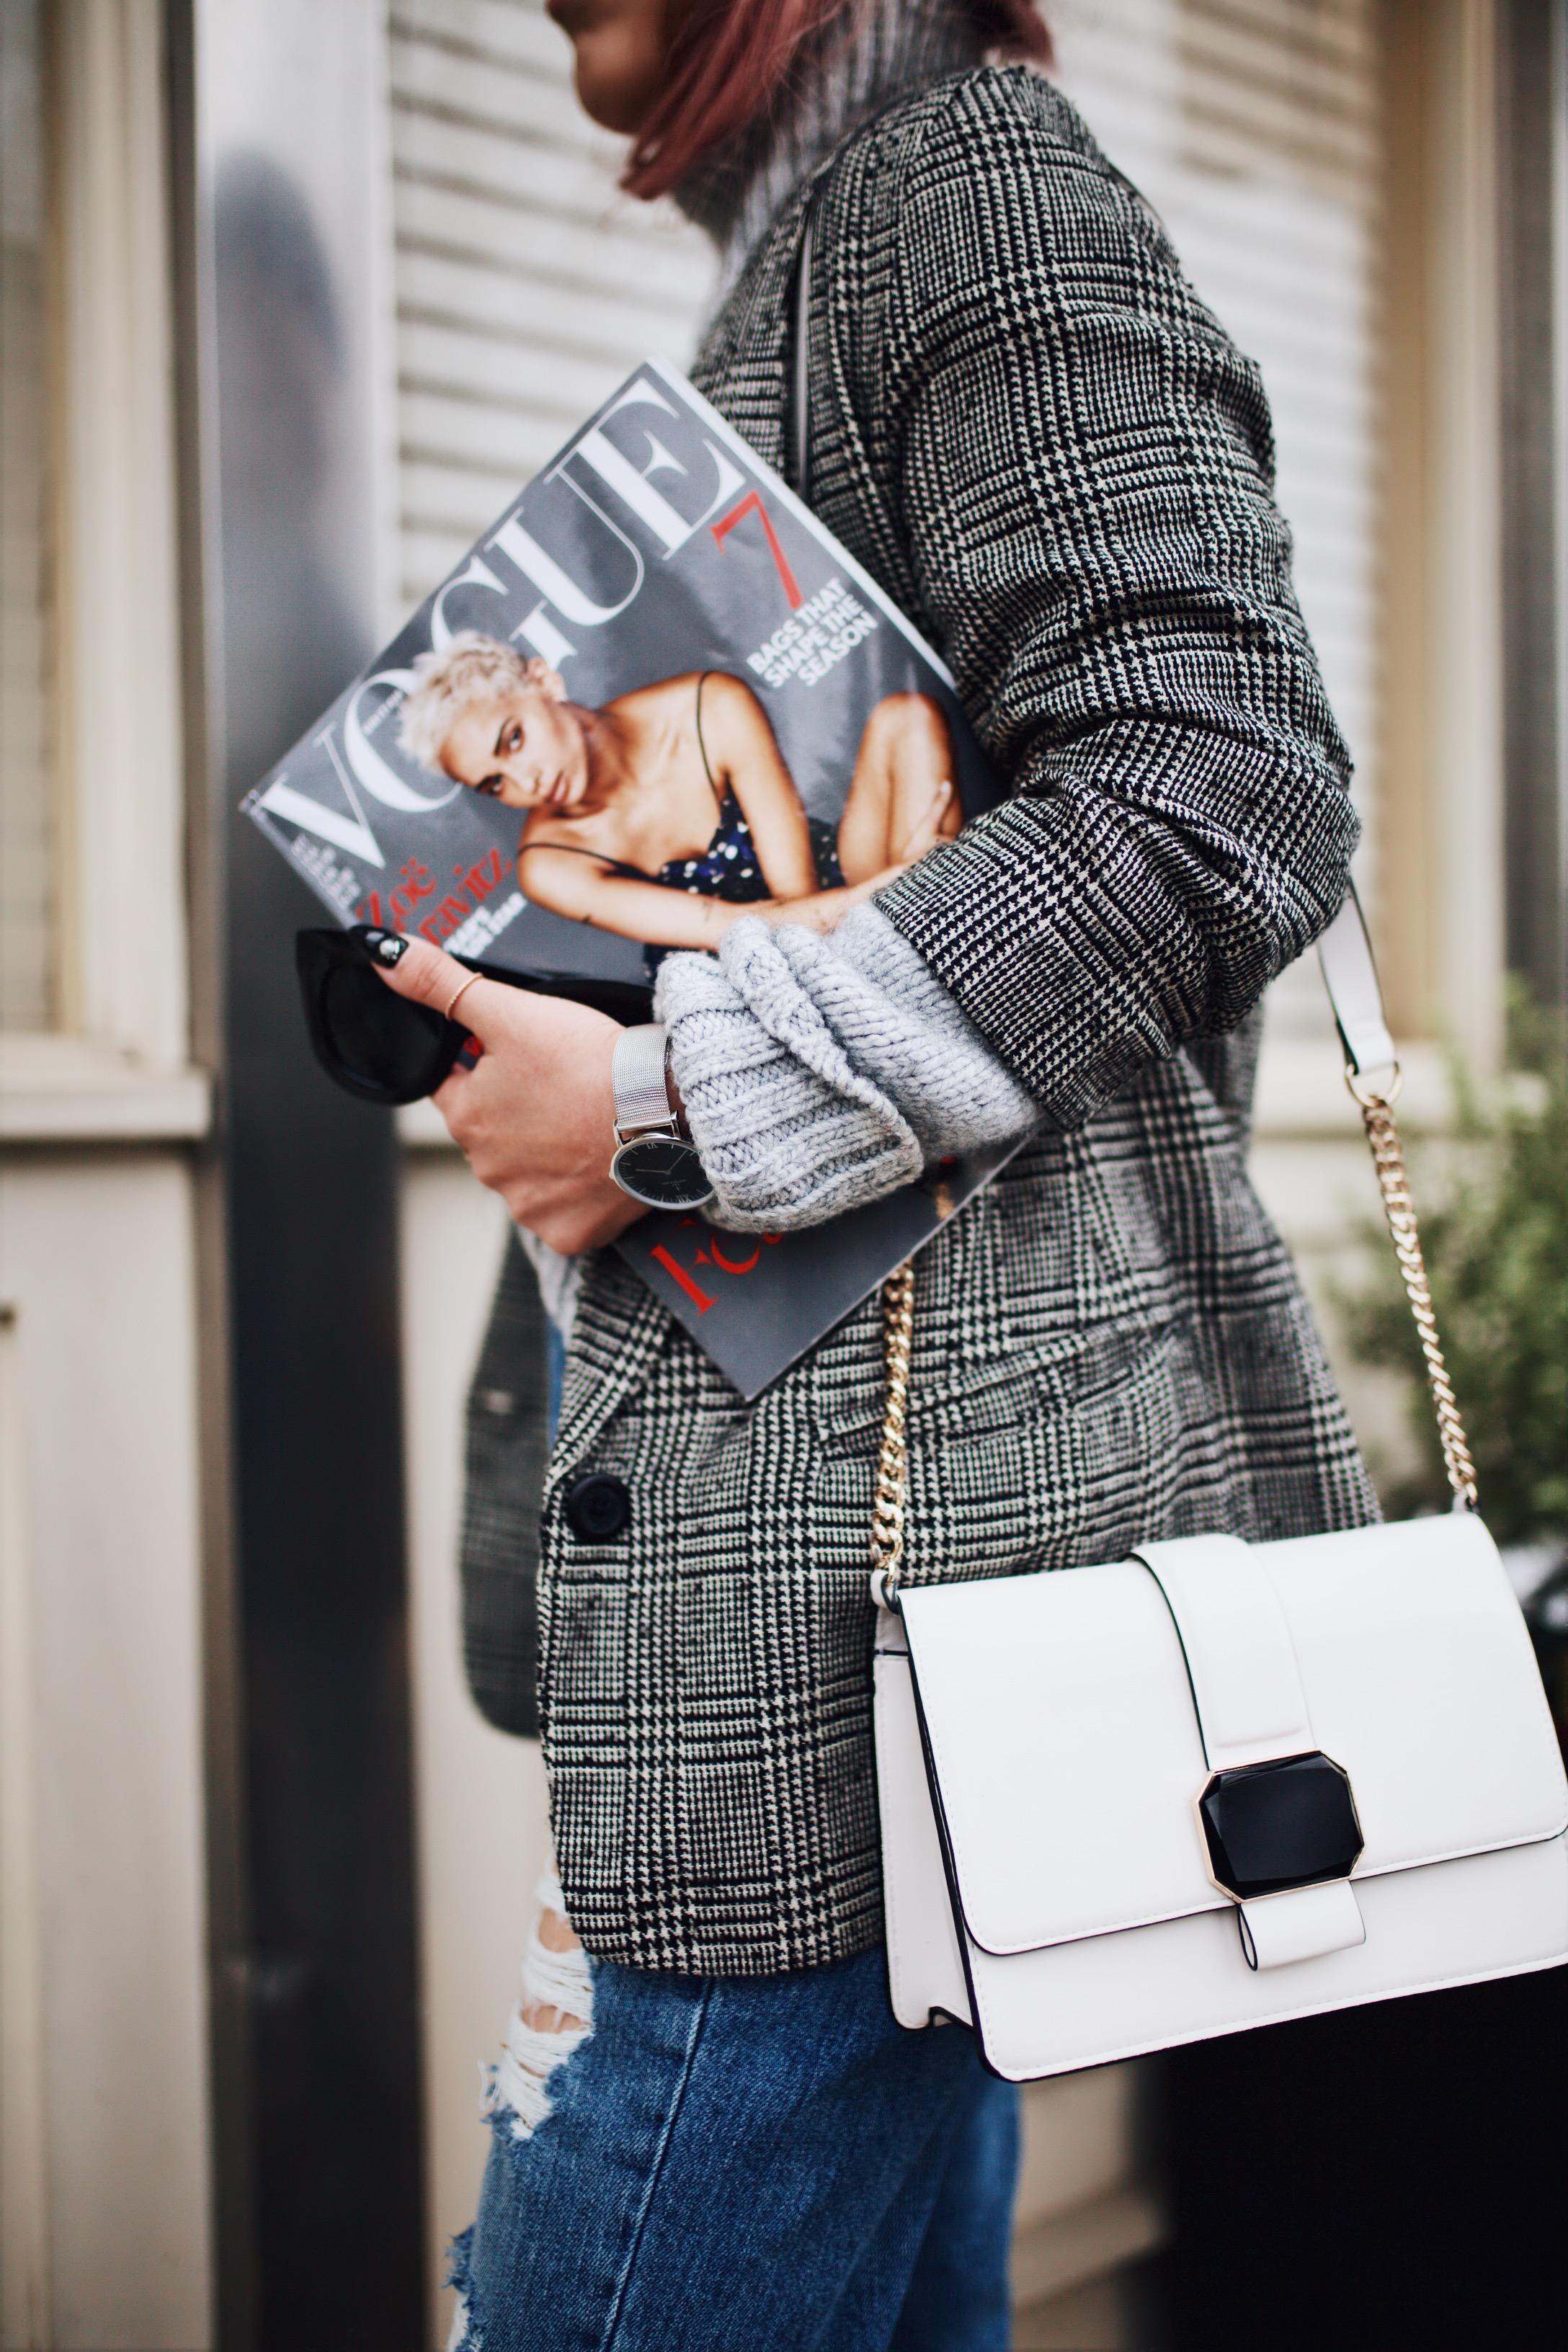 Kapten and Son watch-Zara Gray Turtleneck Sweater-Nordstrom Checked Blazer-ASOS Distressed frayed hem jeans-NAIGAI Glitter Ankle Socks-Black scrappy sandals-H&M White Crossbody Bag-Aritzia Fisherman Hat-Aika's Love Closet-Seattle fashion style blogger-pink hair-Japanese 2